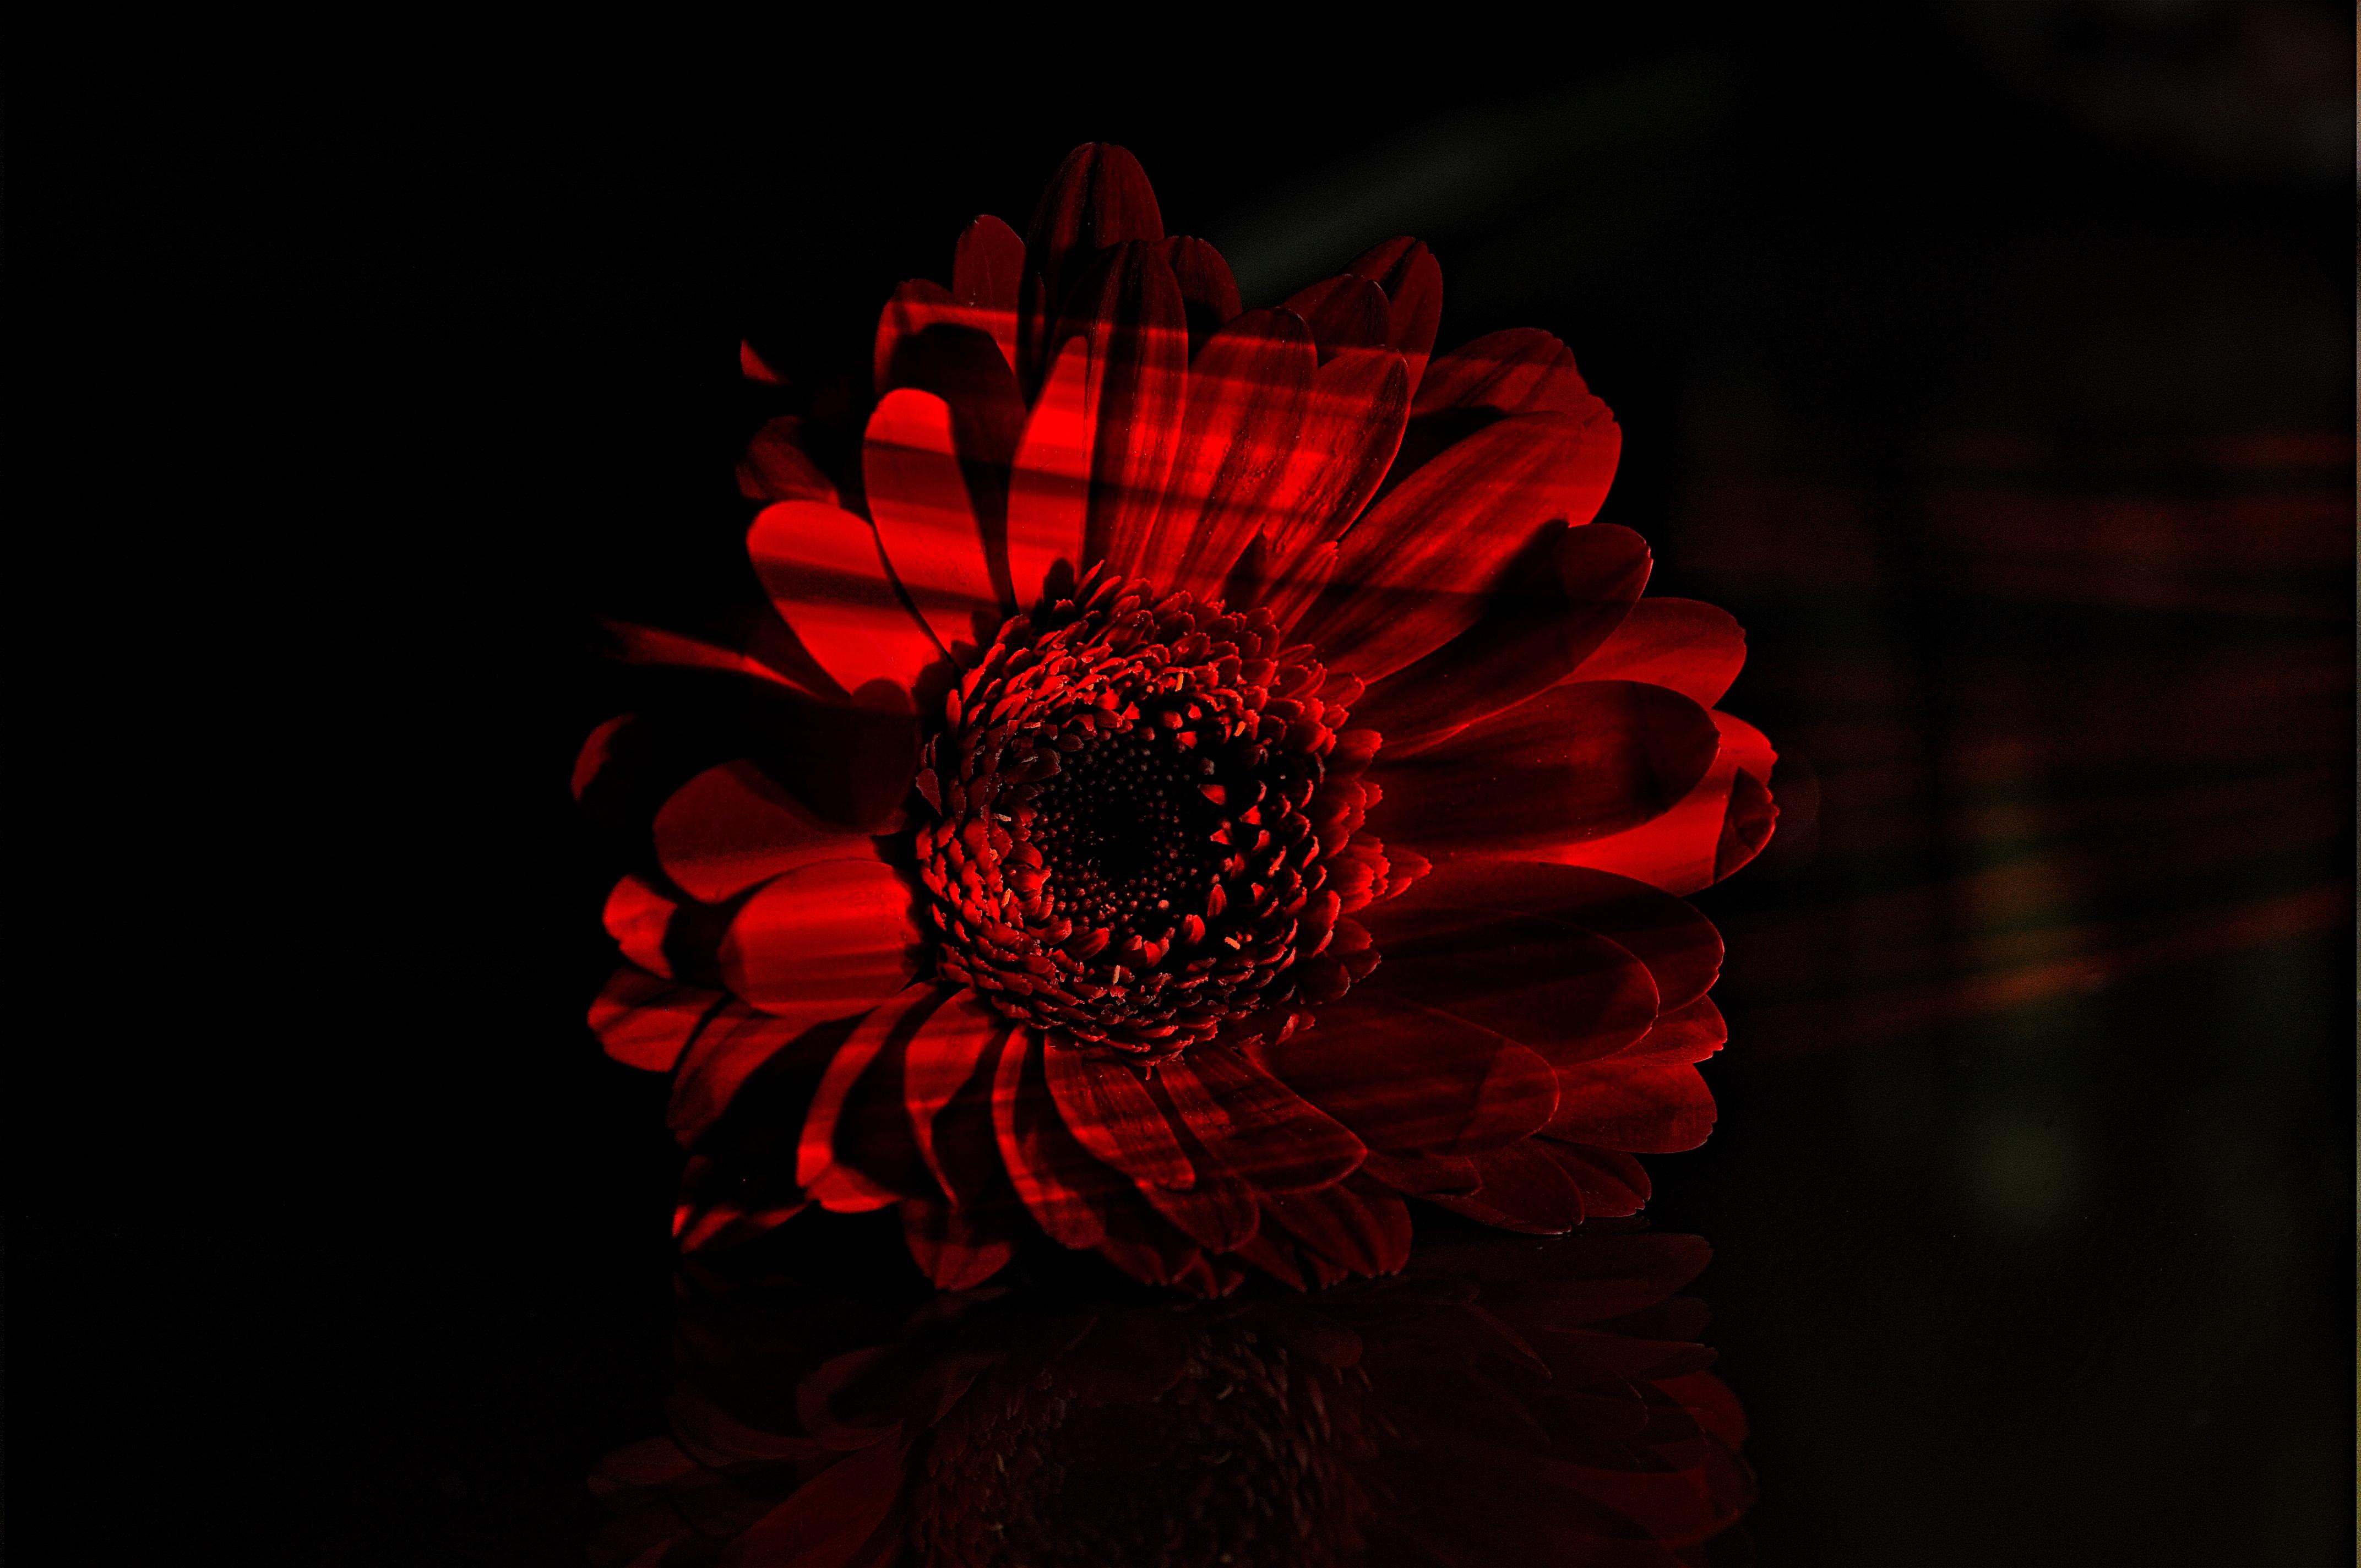 Free images blossom sunlight flower petal bloom dark red darkness black flora close up lichtspiel gerbera light and shadow macro photography